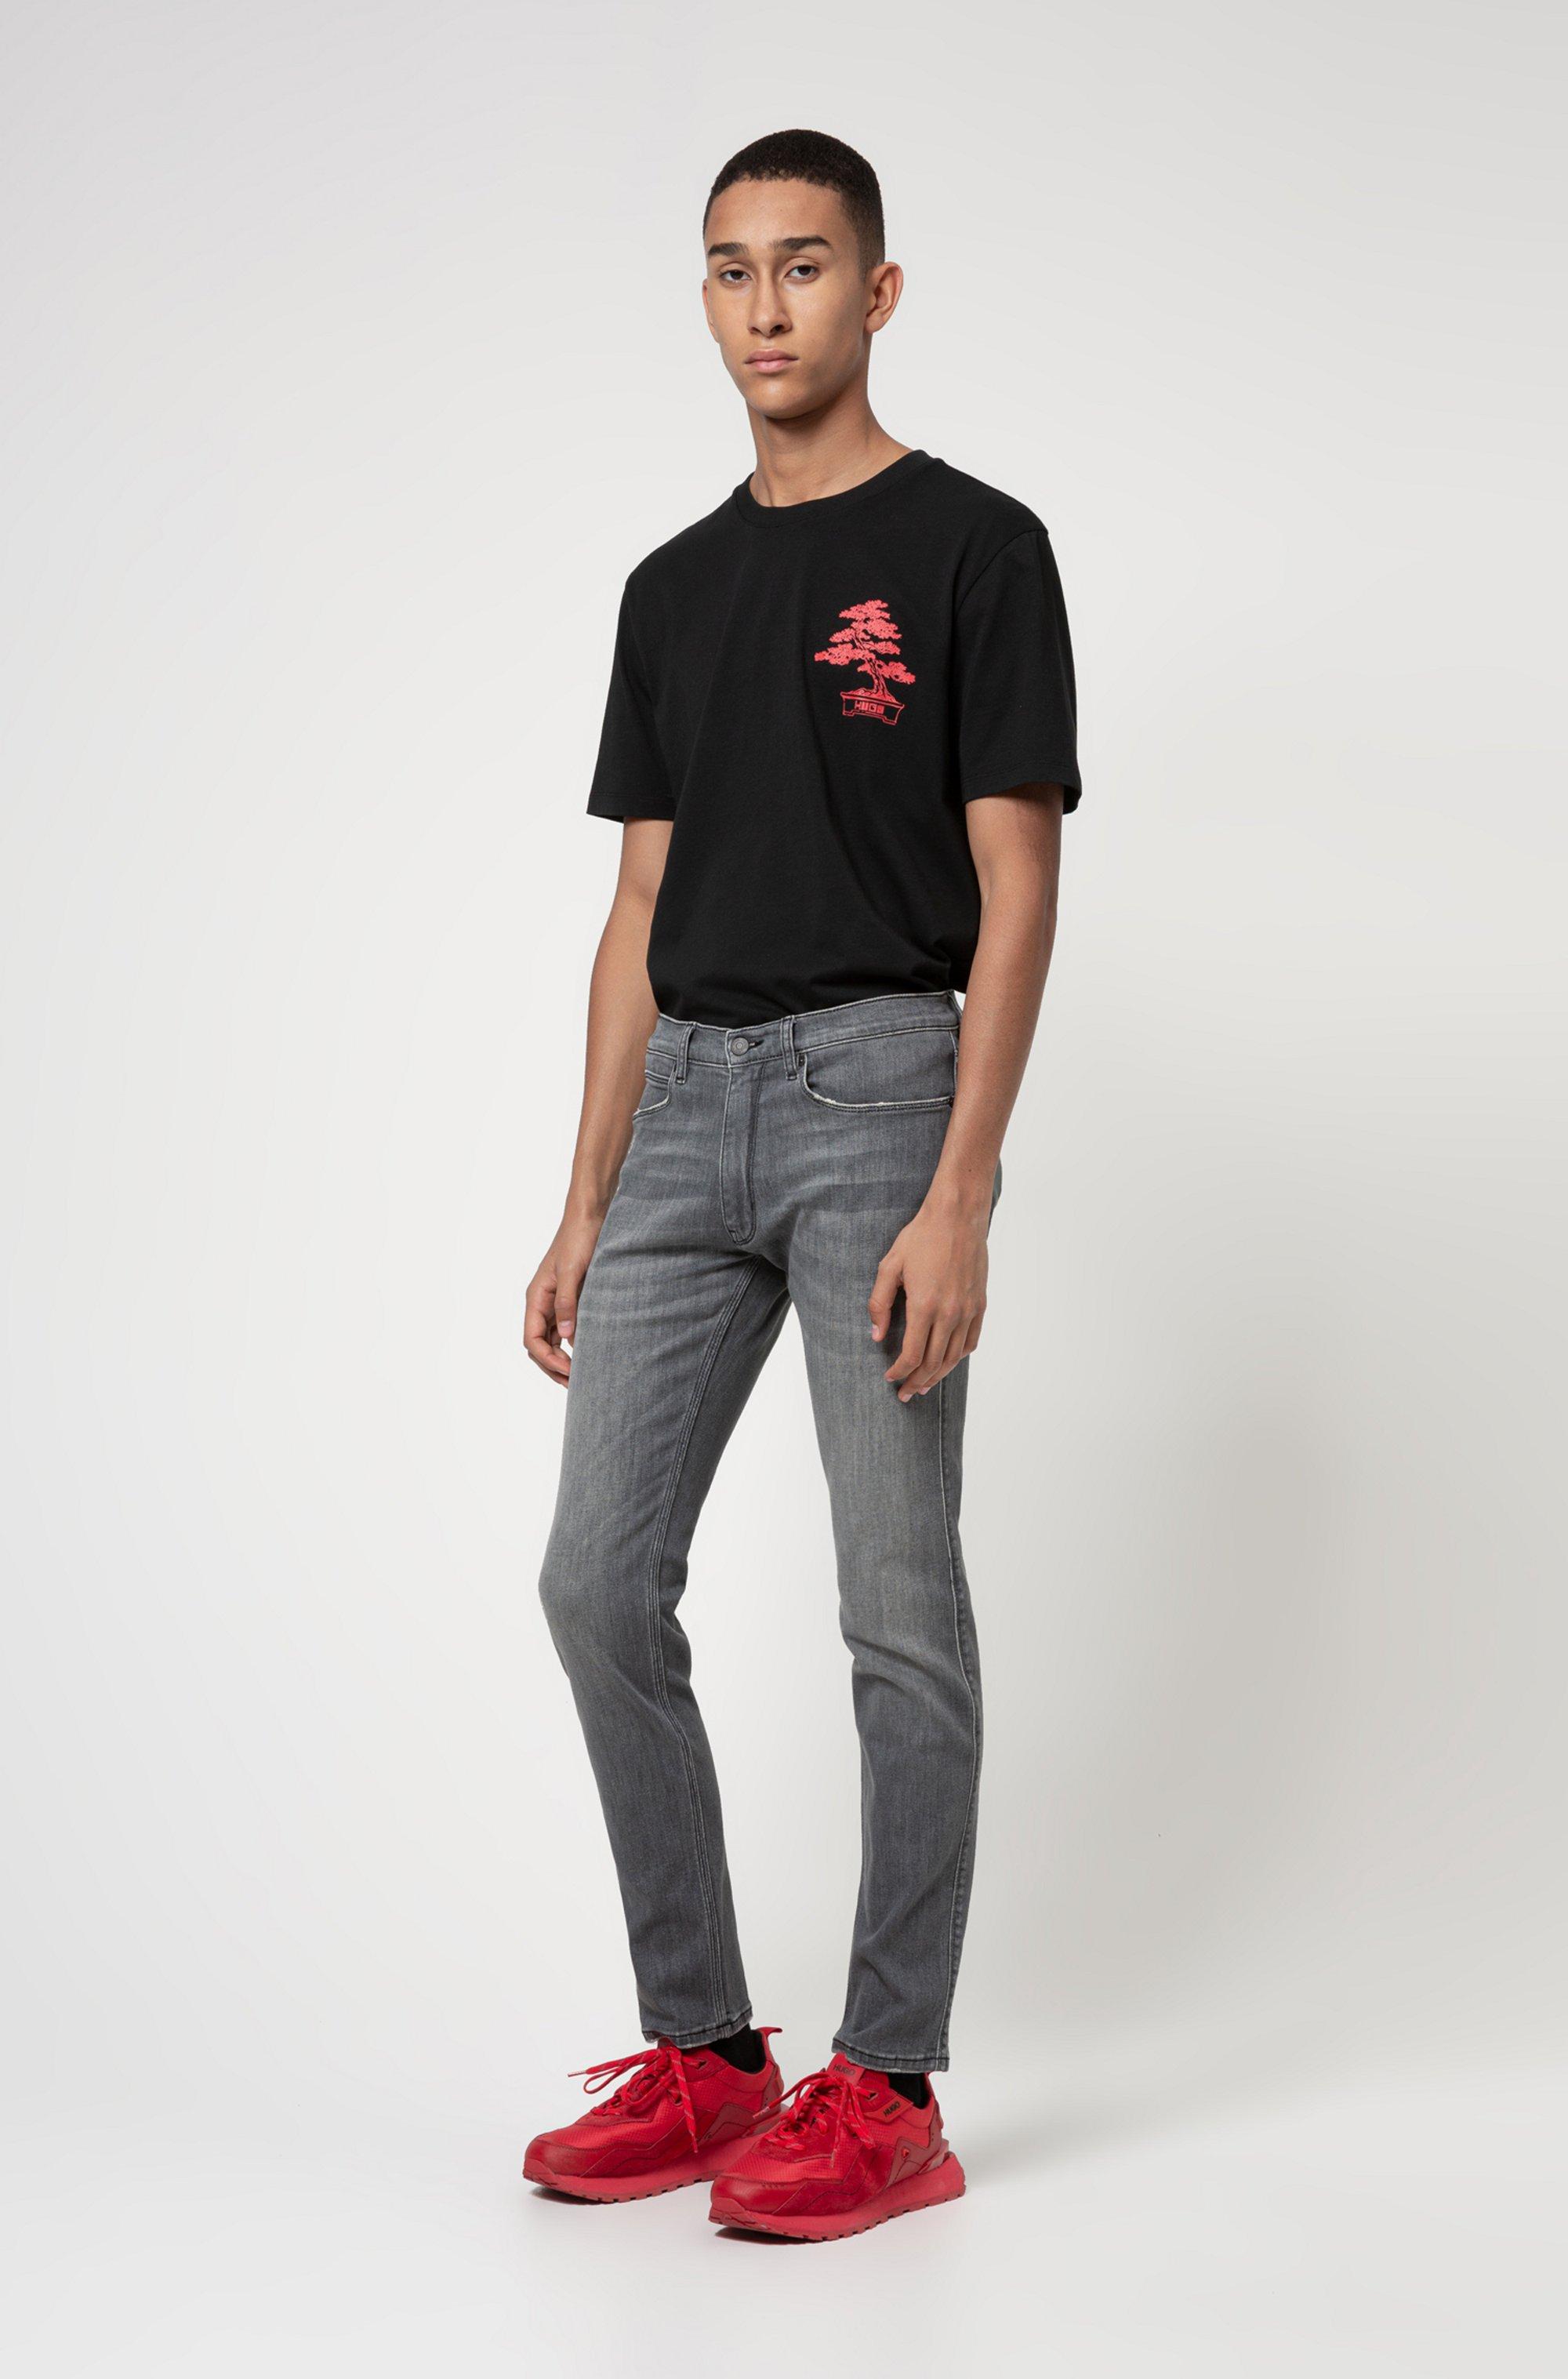 Extra-slim-fit jeans in grey comfort-stretch denim